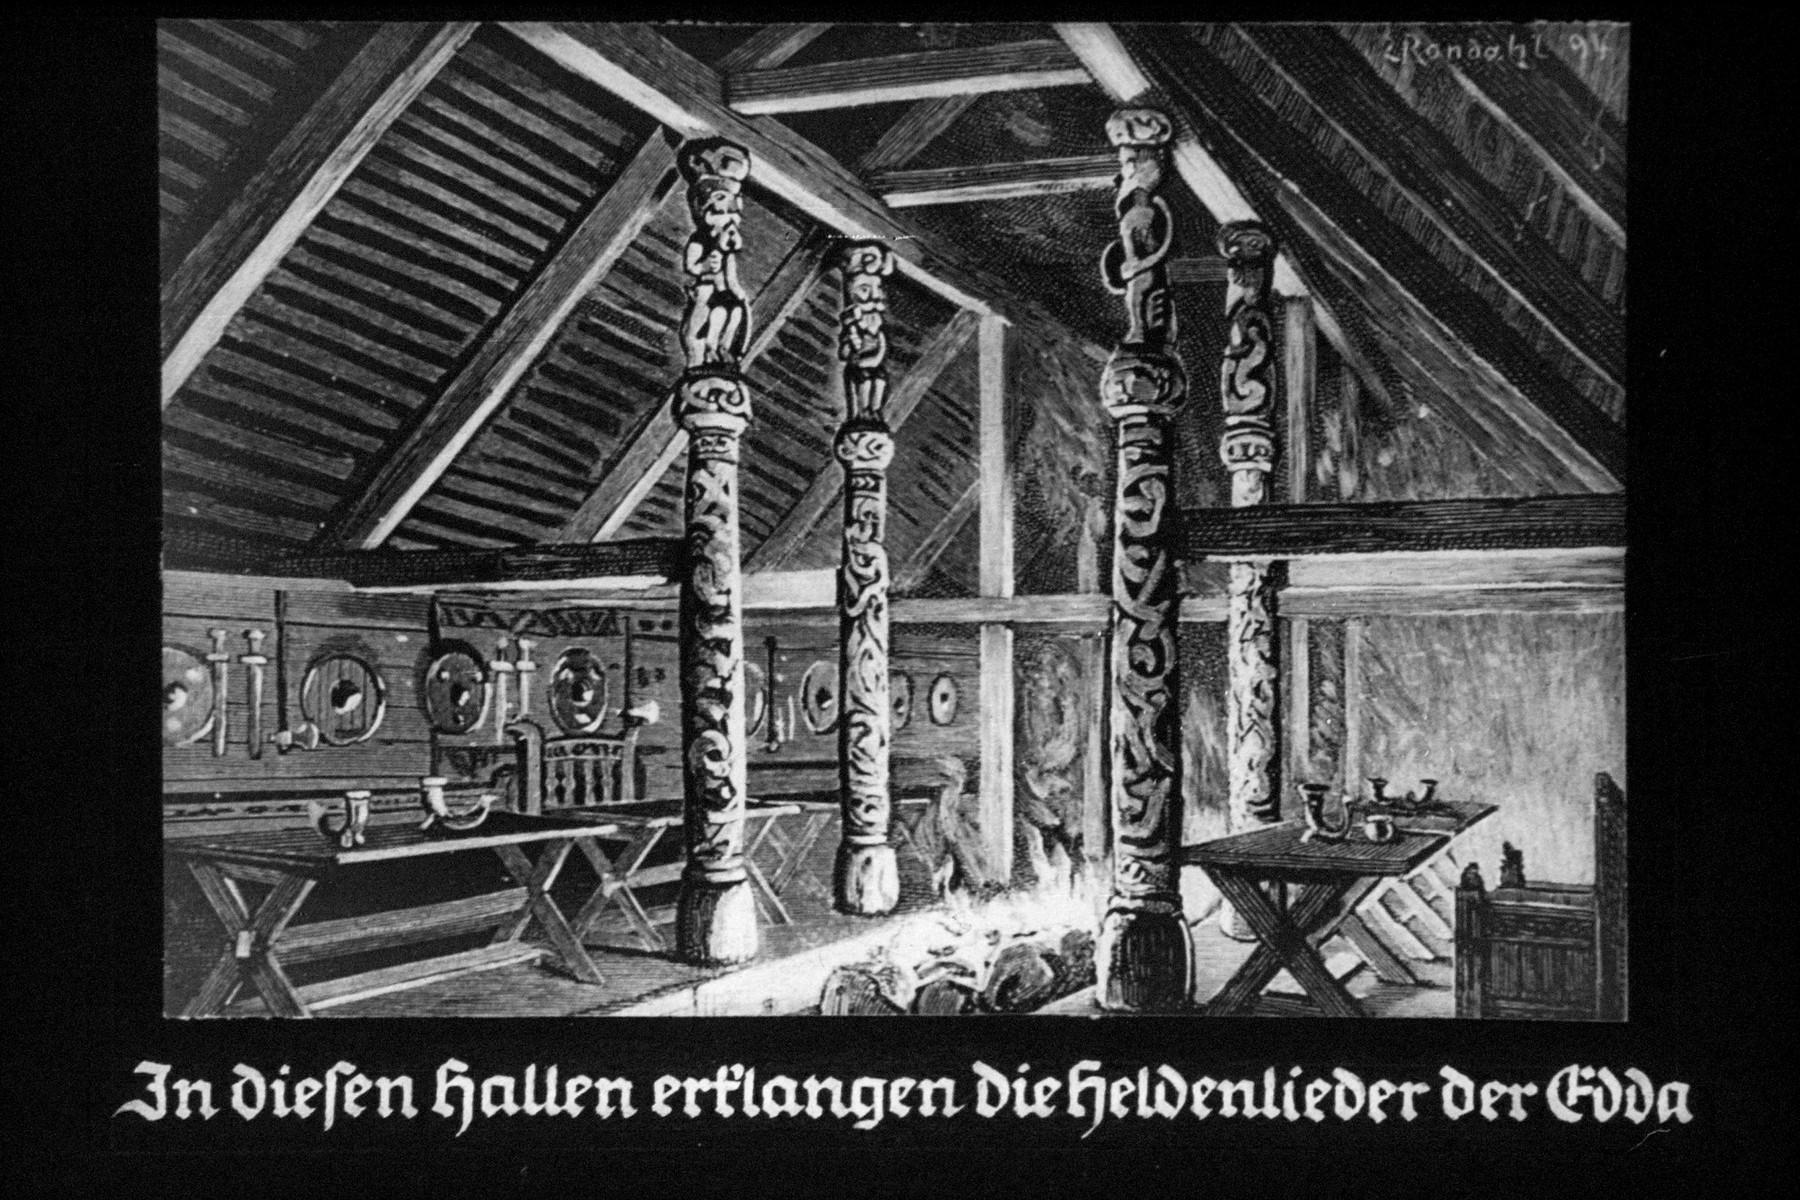 "36th Nazi propaganda slide for a Hitler Youth educational presentation entitled ""5000 years of German Culture.""  In diesen Hallen erklangen die Heldenlieder der Edda // The these halls rang the heroic songs of Edda."